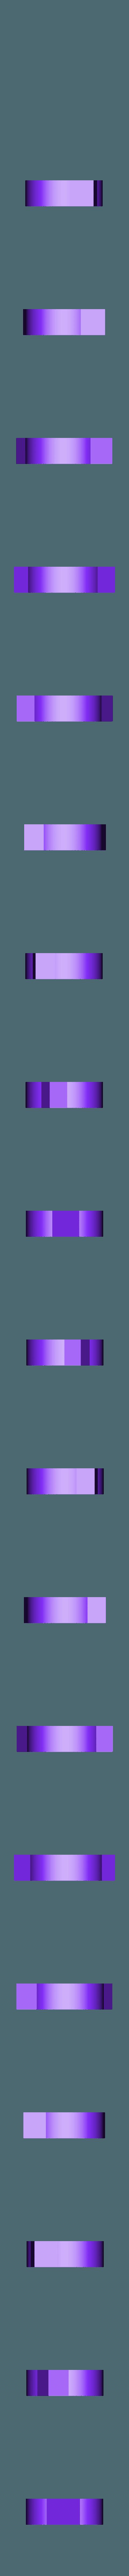 pusher 2.stl Download free STL file Pusher • 3D printer template, itsallinyourhead1